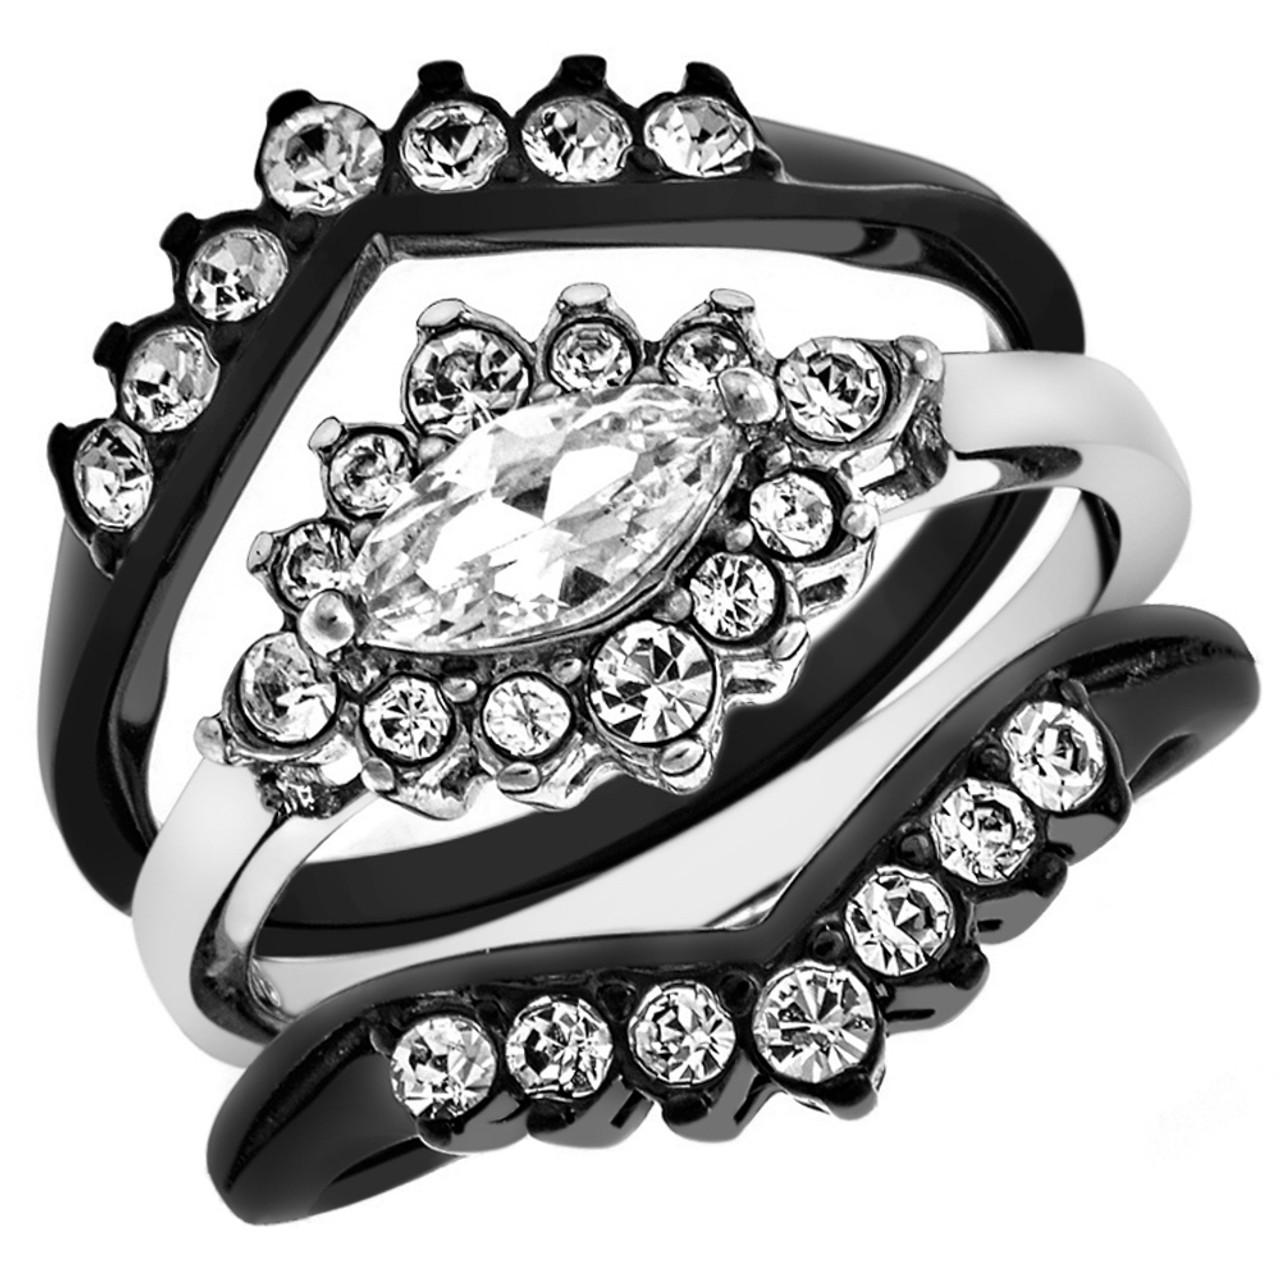 1.9 Ct Princess Cut AAA CZ Black Stainless Steel Wedding Ring Band Set Women/'s